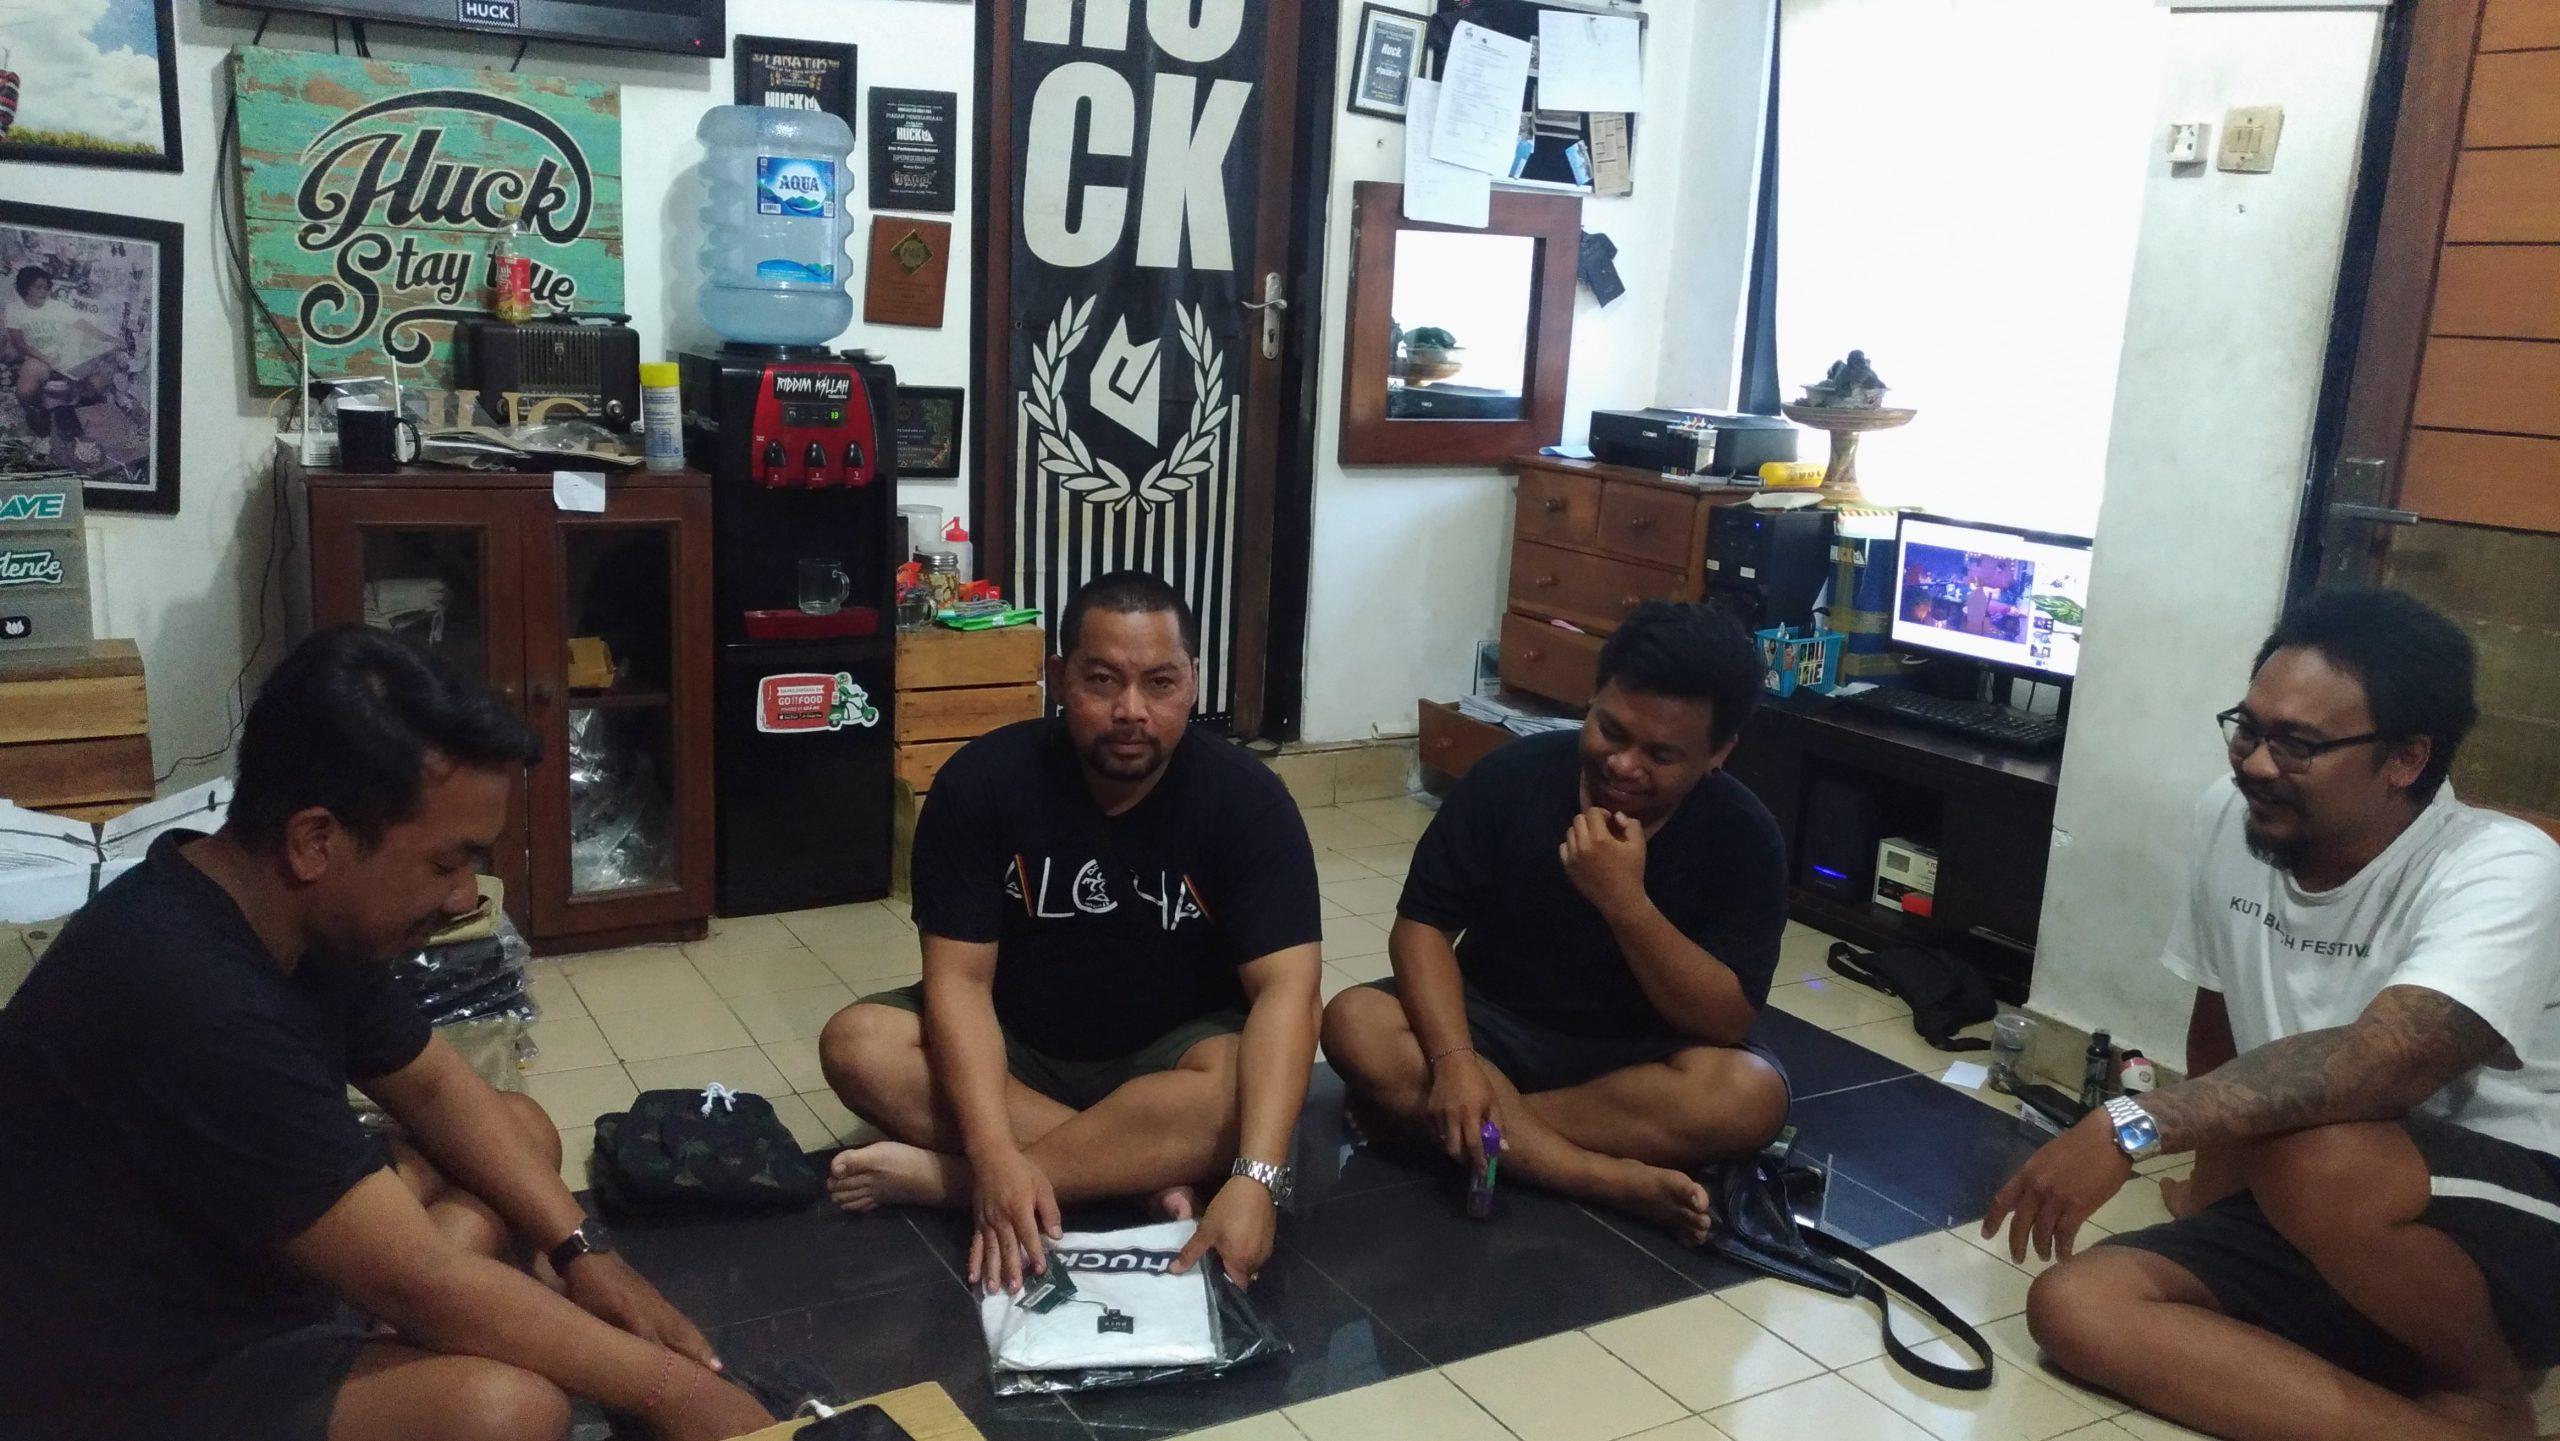 Foto: HUCK DISTRO PENDIRI Huck Distro saat berbincang dengan wakil Ketua LPM Legian, Ketut Sentanu. Foto: gay